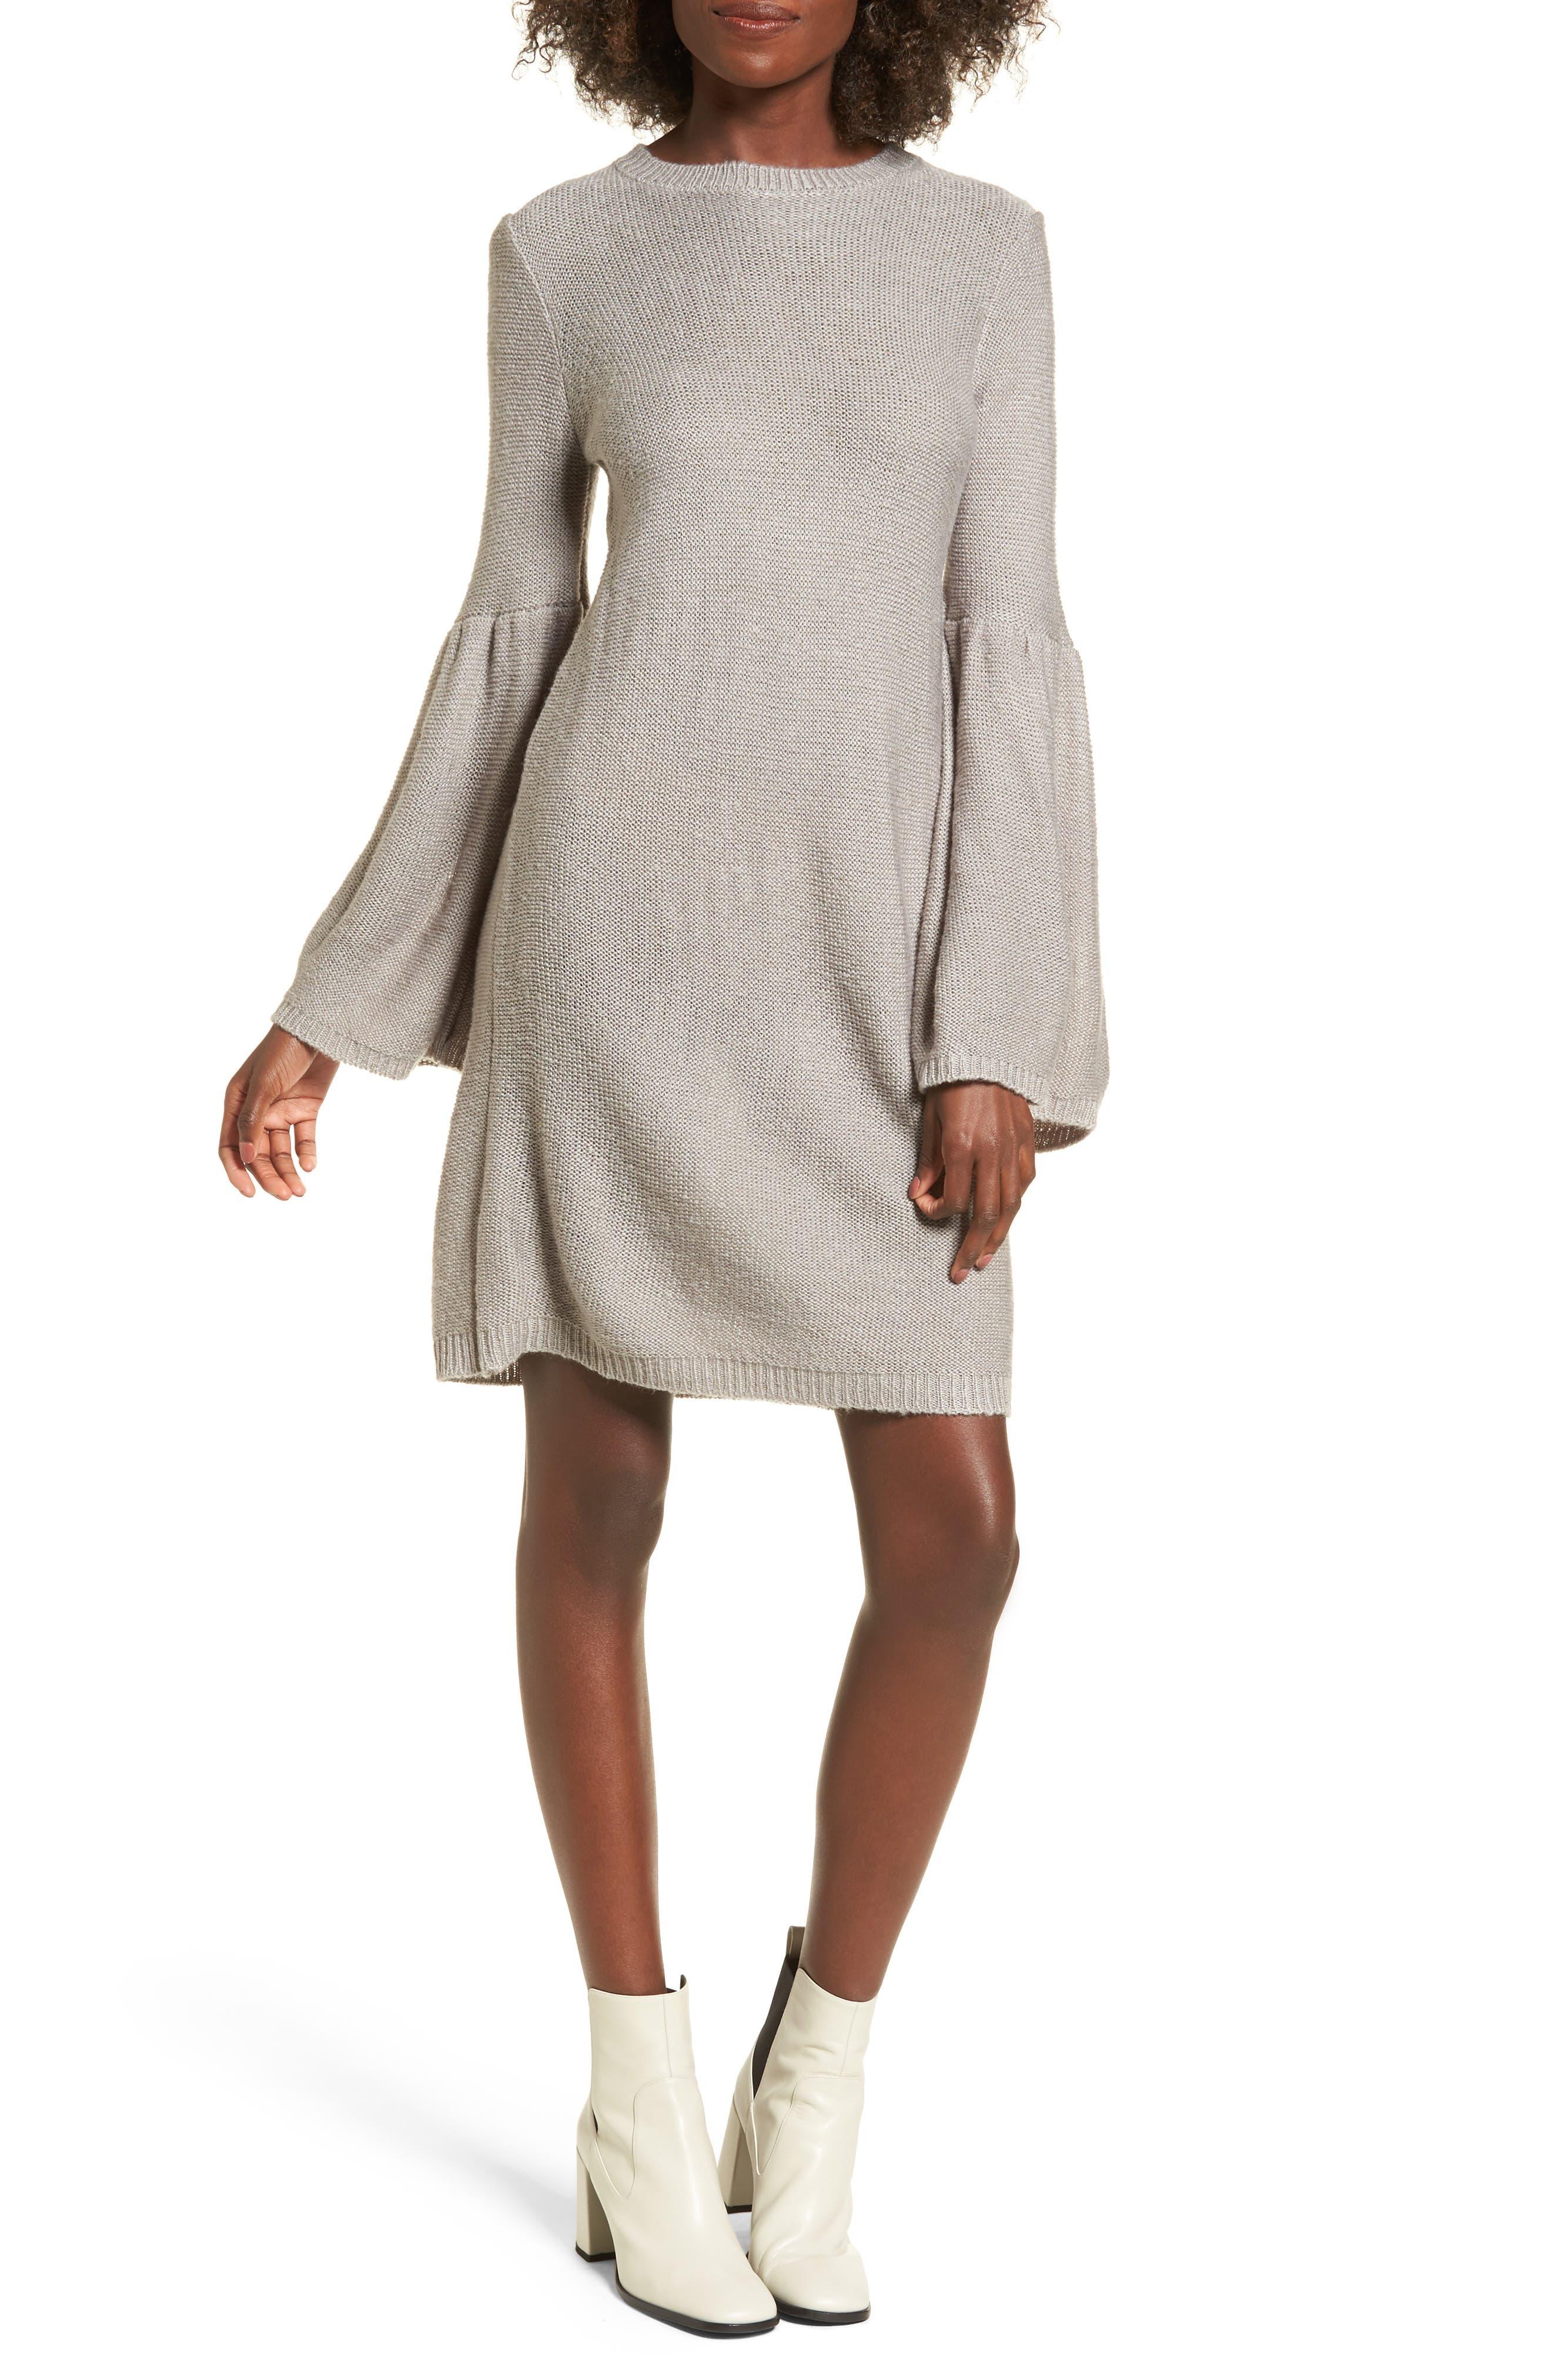 Alternate Image 1 Selected - Cotton Emporium Bell Sleeve Sweater Dress